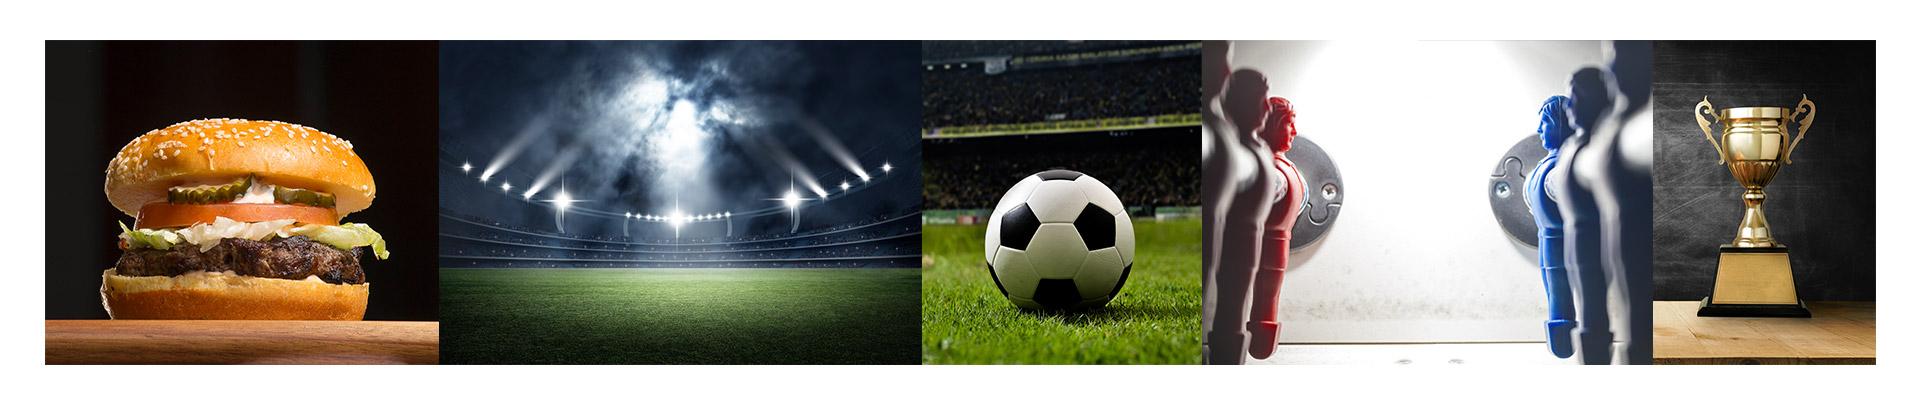 dukepubs-futbol2018-stock-images